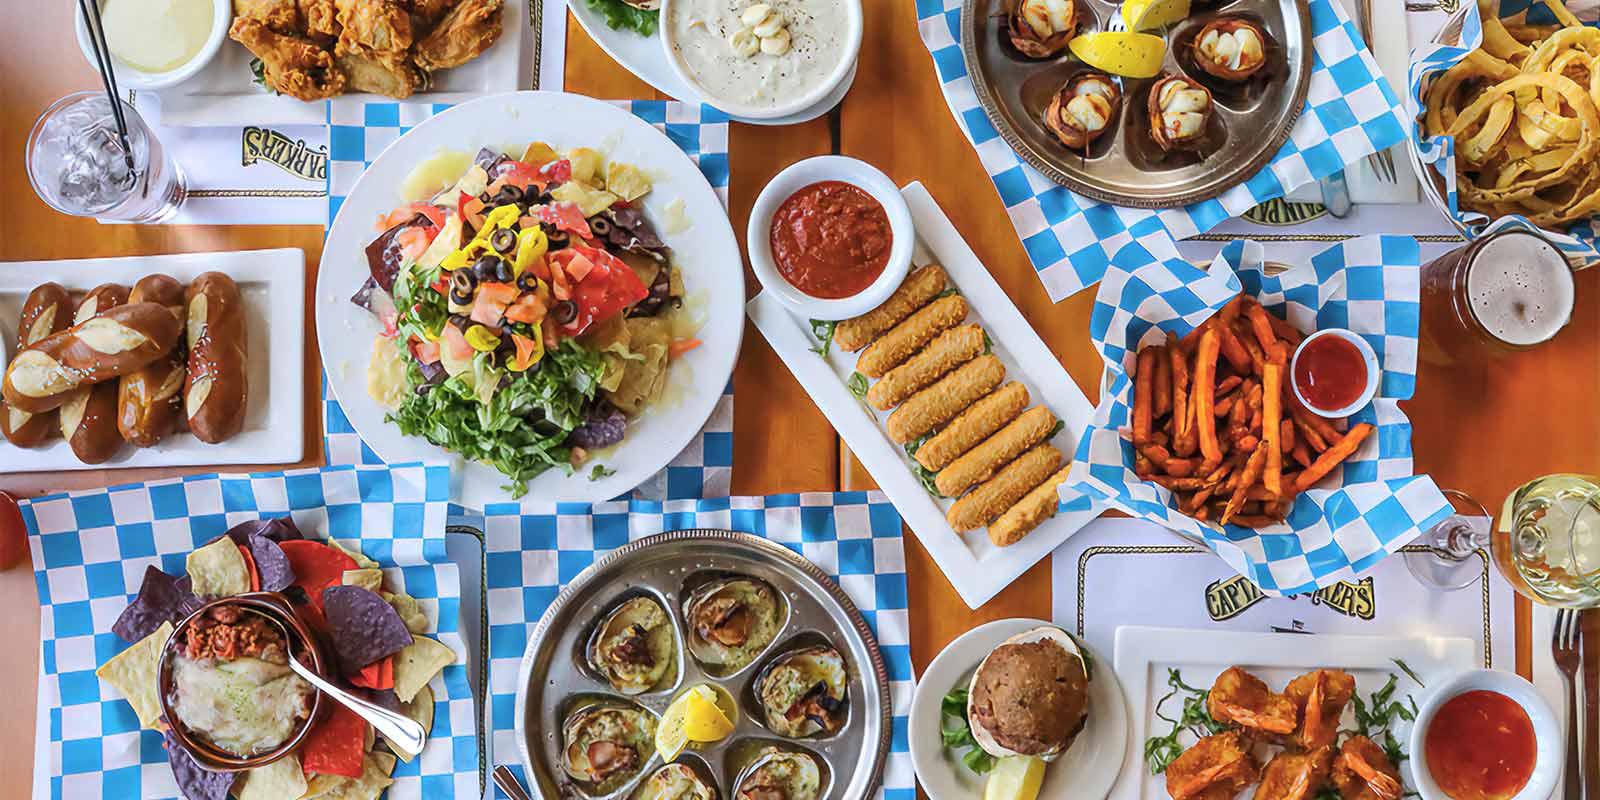 Captain Parkers classic pub appetizers including clam chowder, quahogs, oysters, mozzarella sticks, shrimp, chicken wings and more